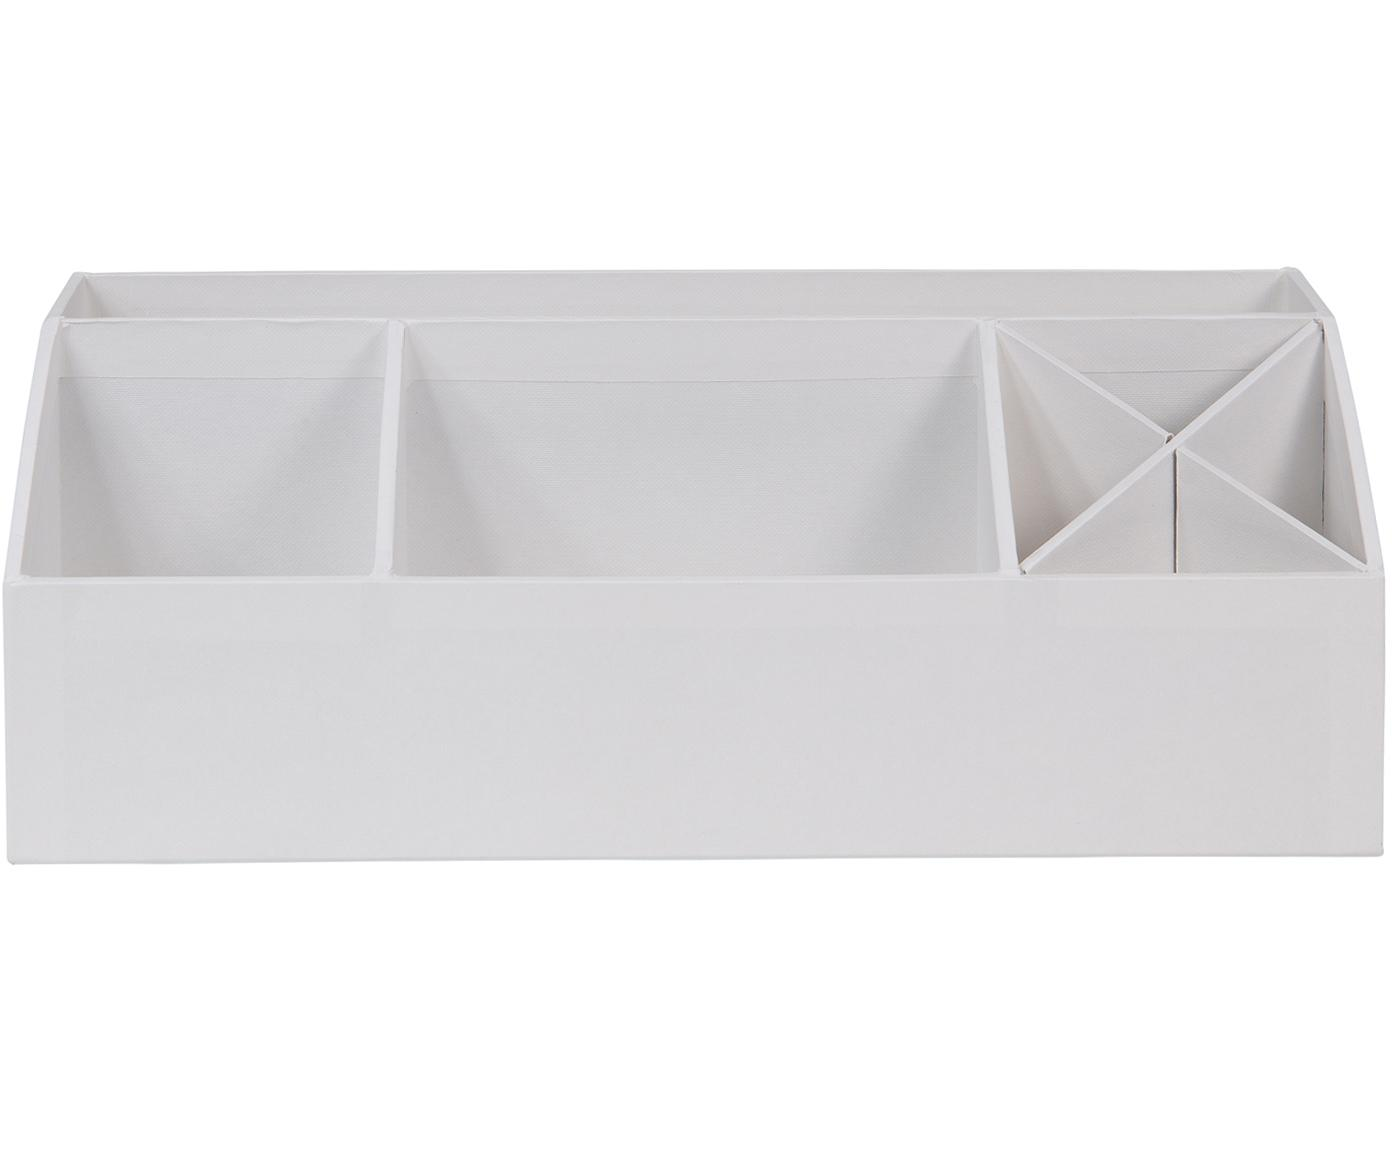 Bureau organizer Elisa, Massief, gelamineerd karton, Wit, 33 x 13 cm